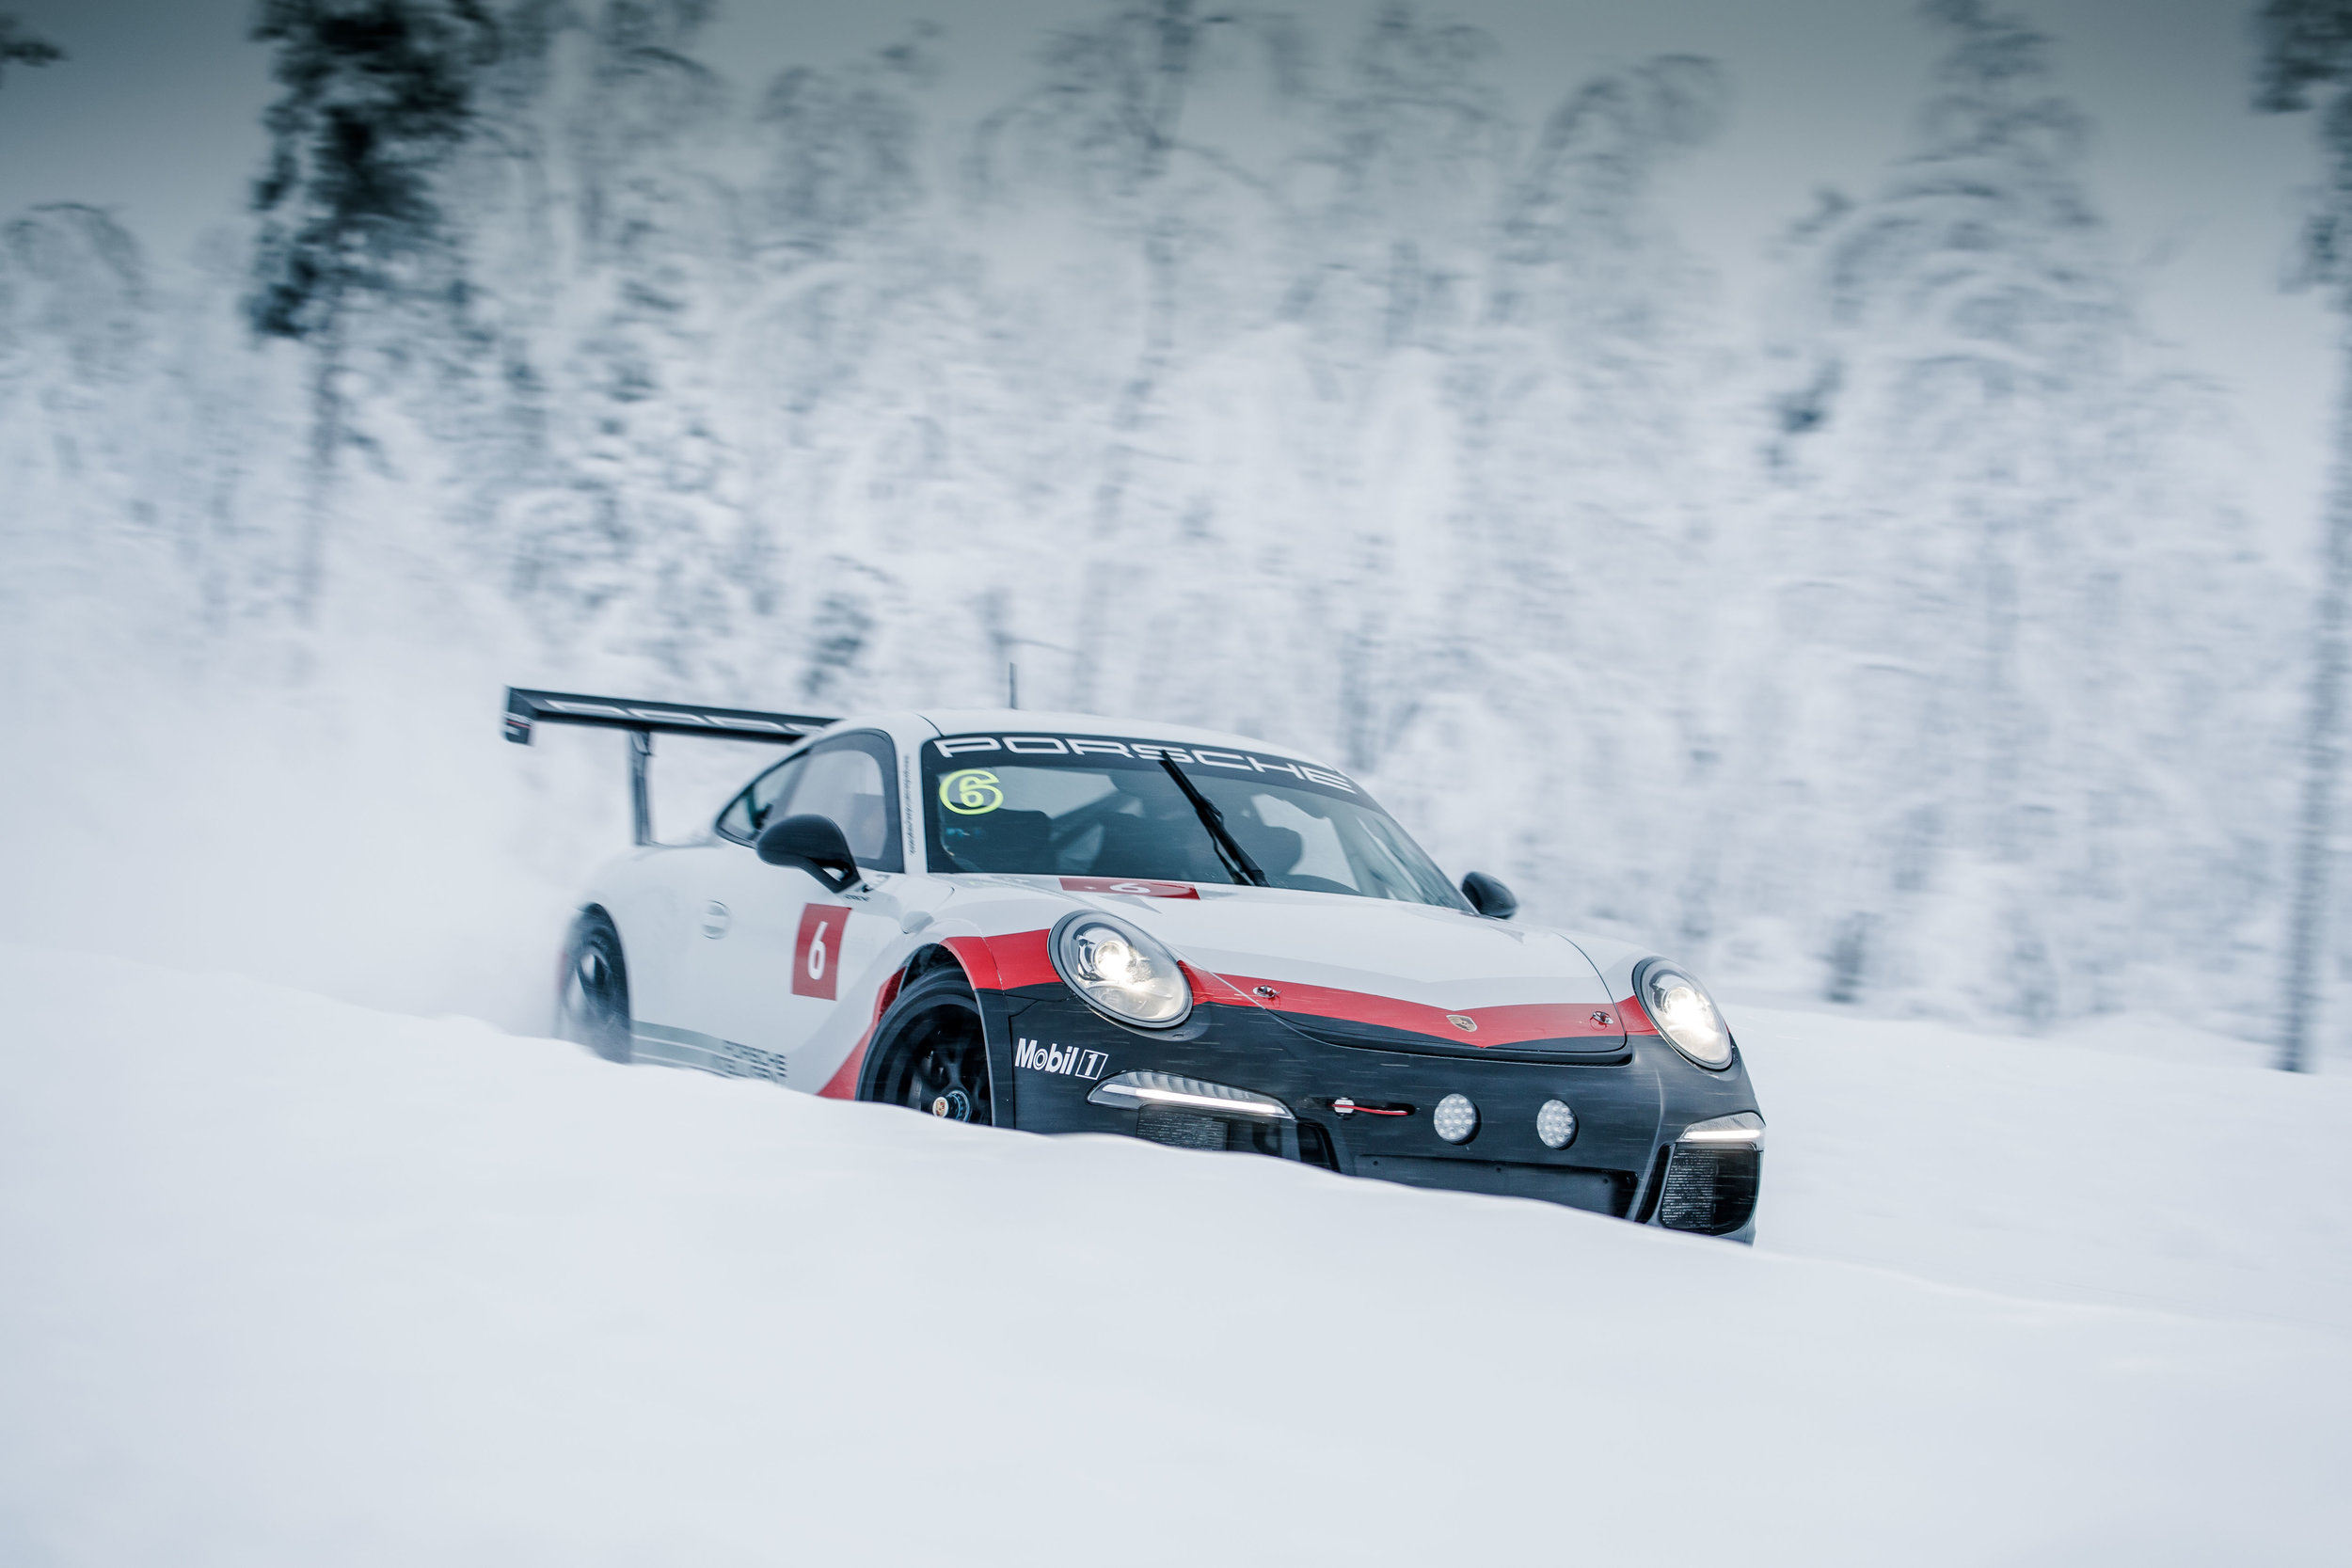 Porsche Ice Experience on Ice_30_01_2019_0352_175663.jpg